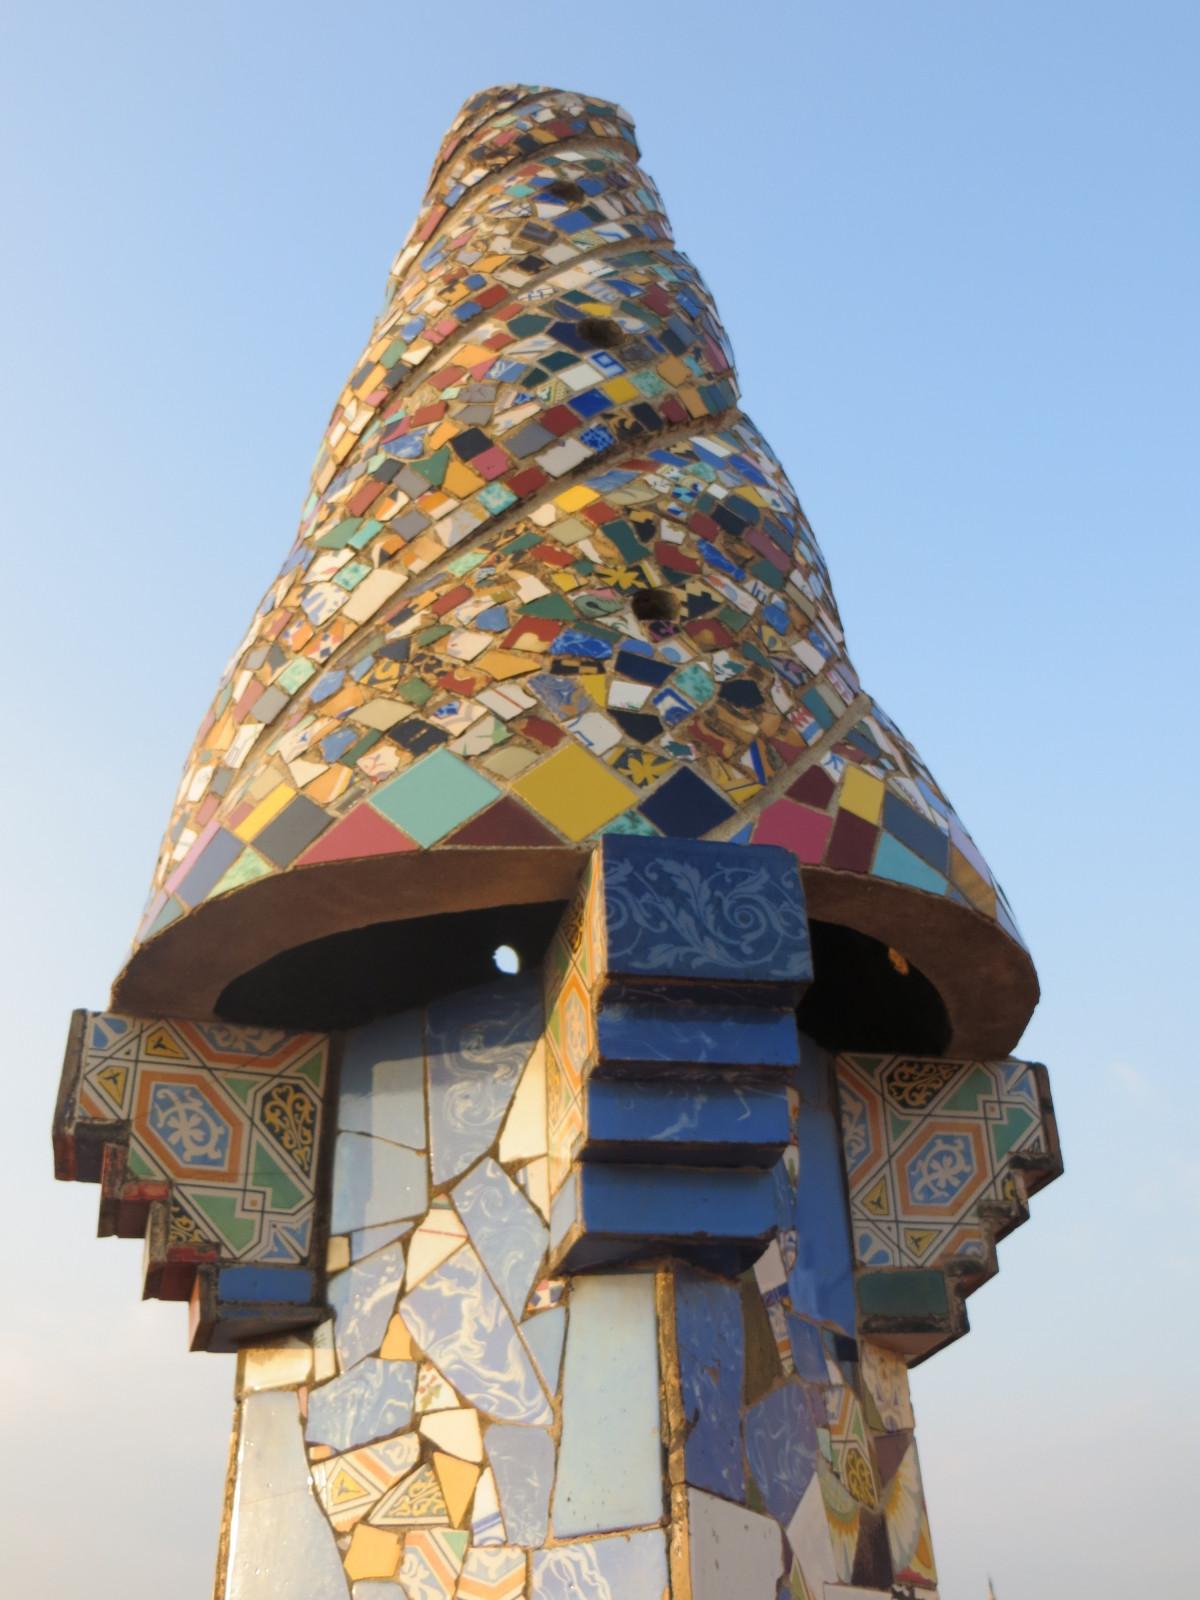 Free Images Monument Tower Landmark Toy Barcelona